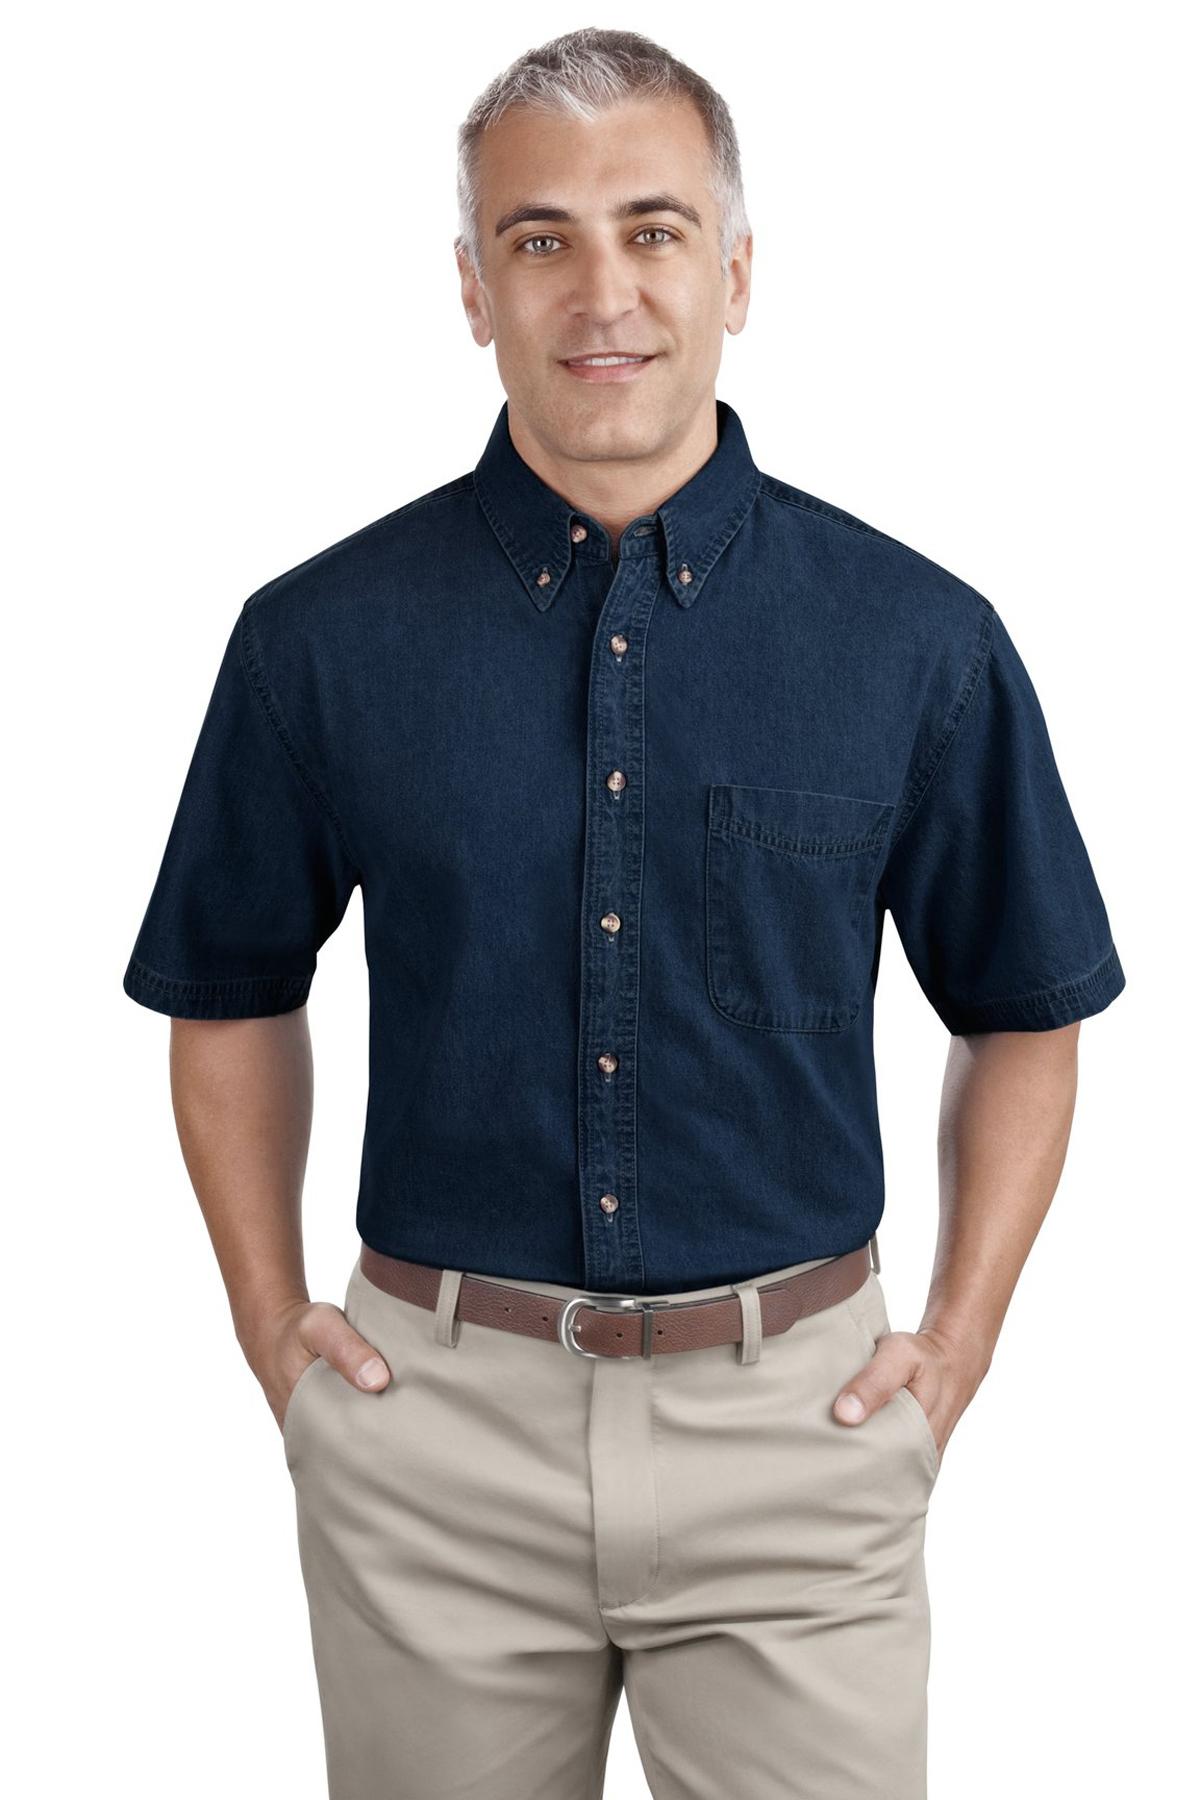 Woven-Shirts-Cotton-27